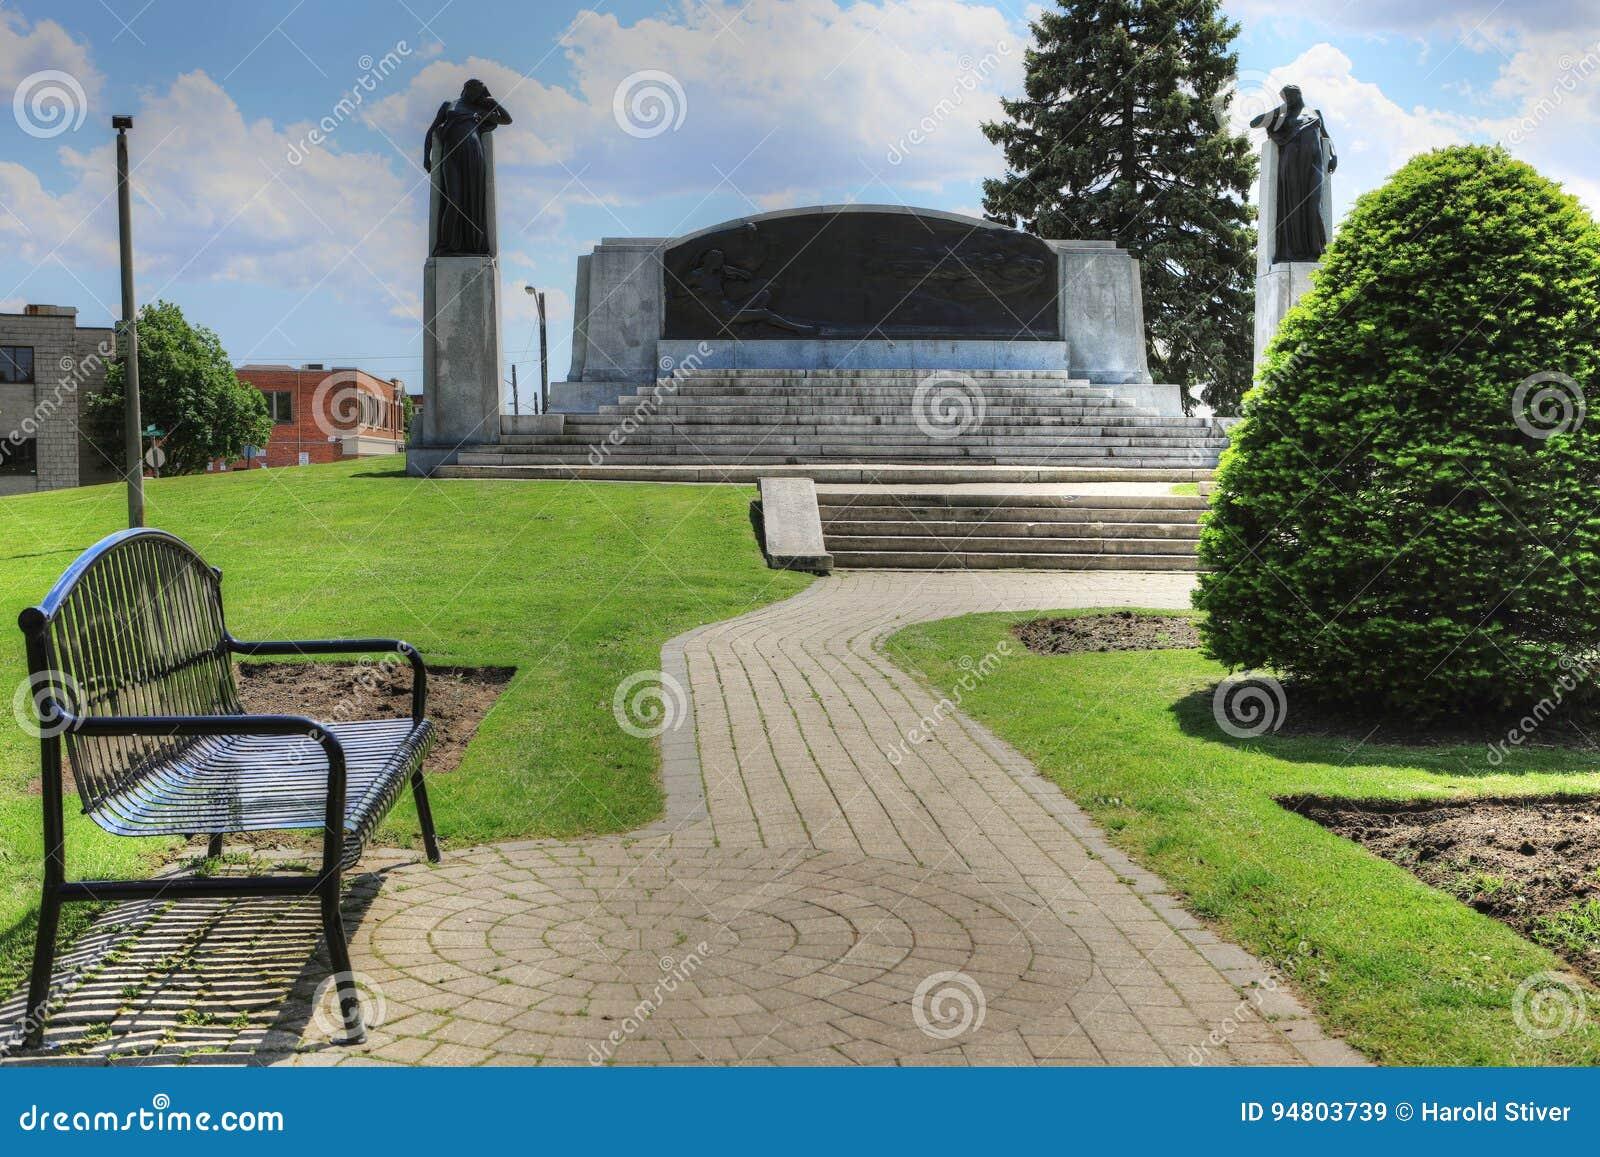 Memorial in Brantford, Canada to Alexander Graham Bell